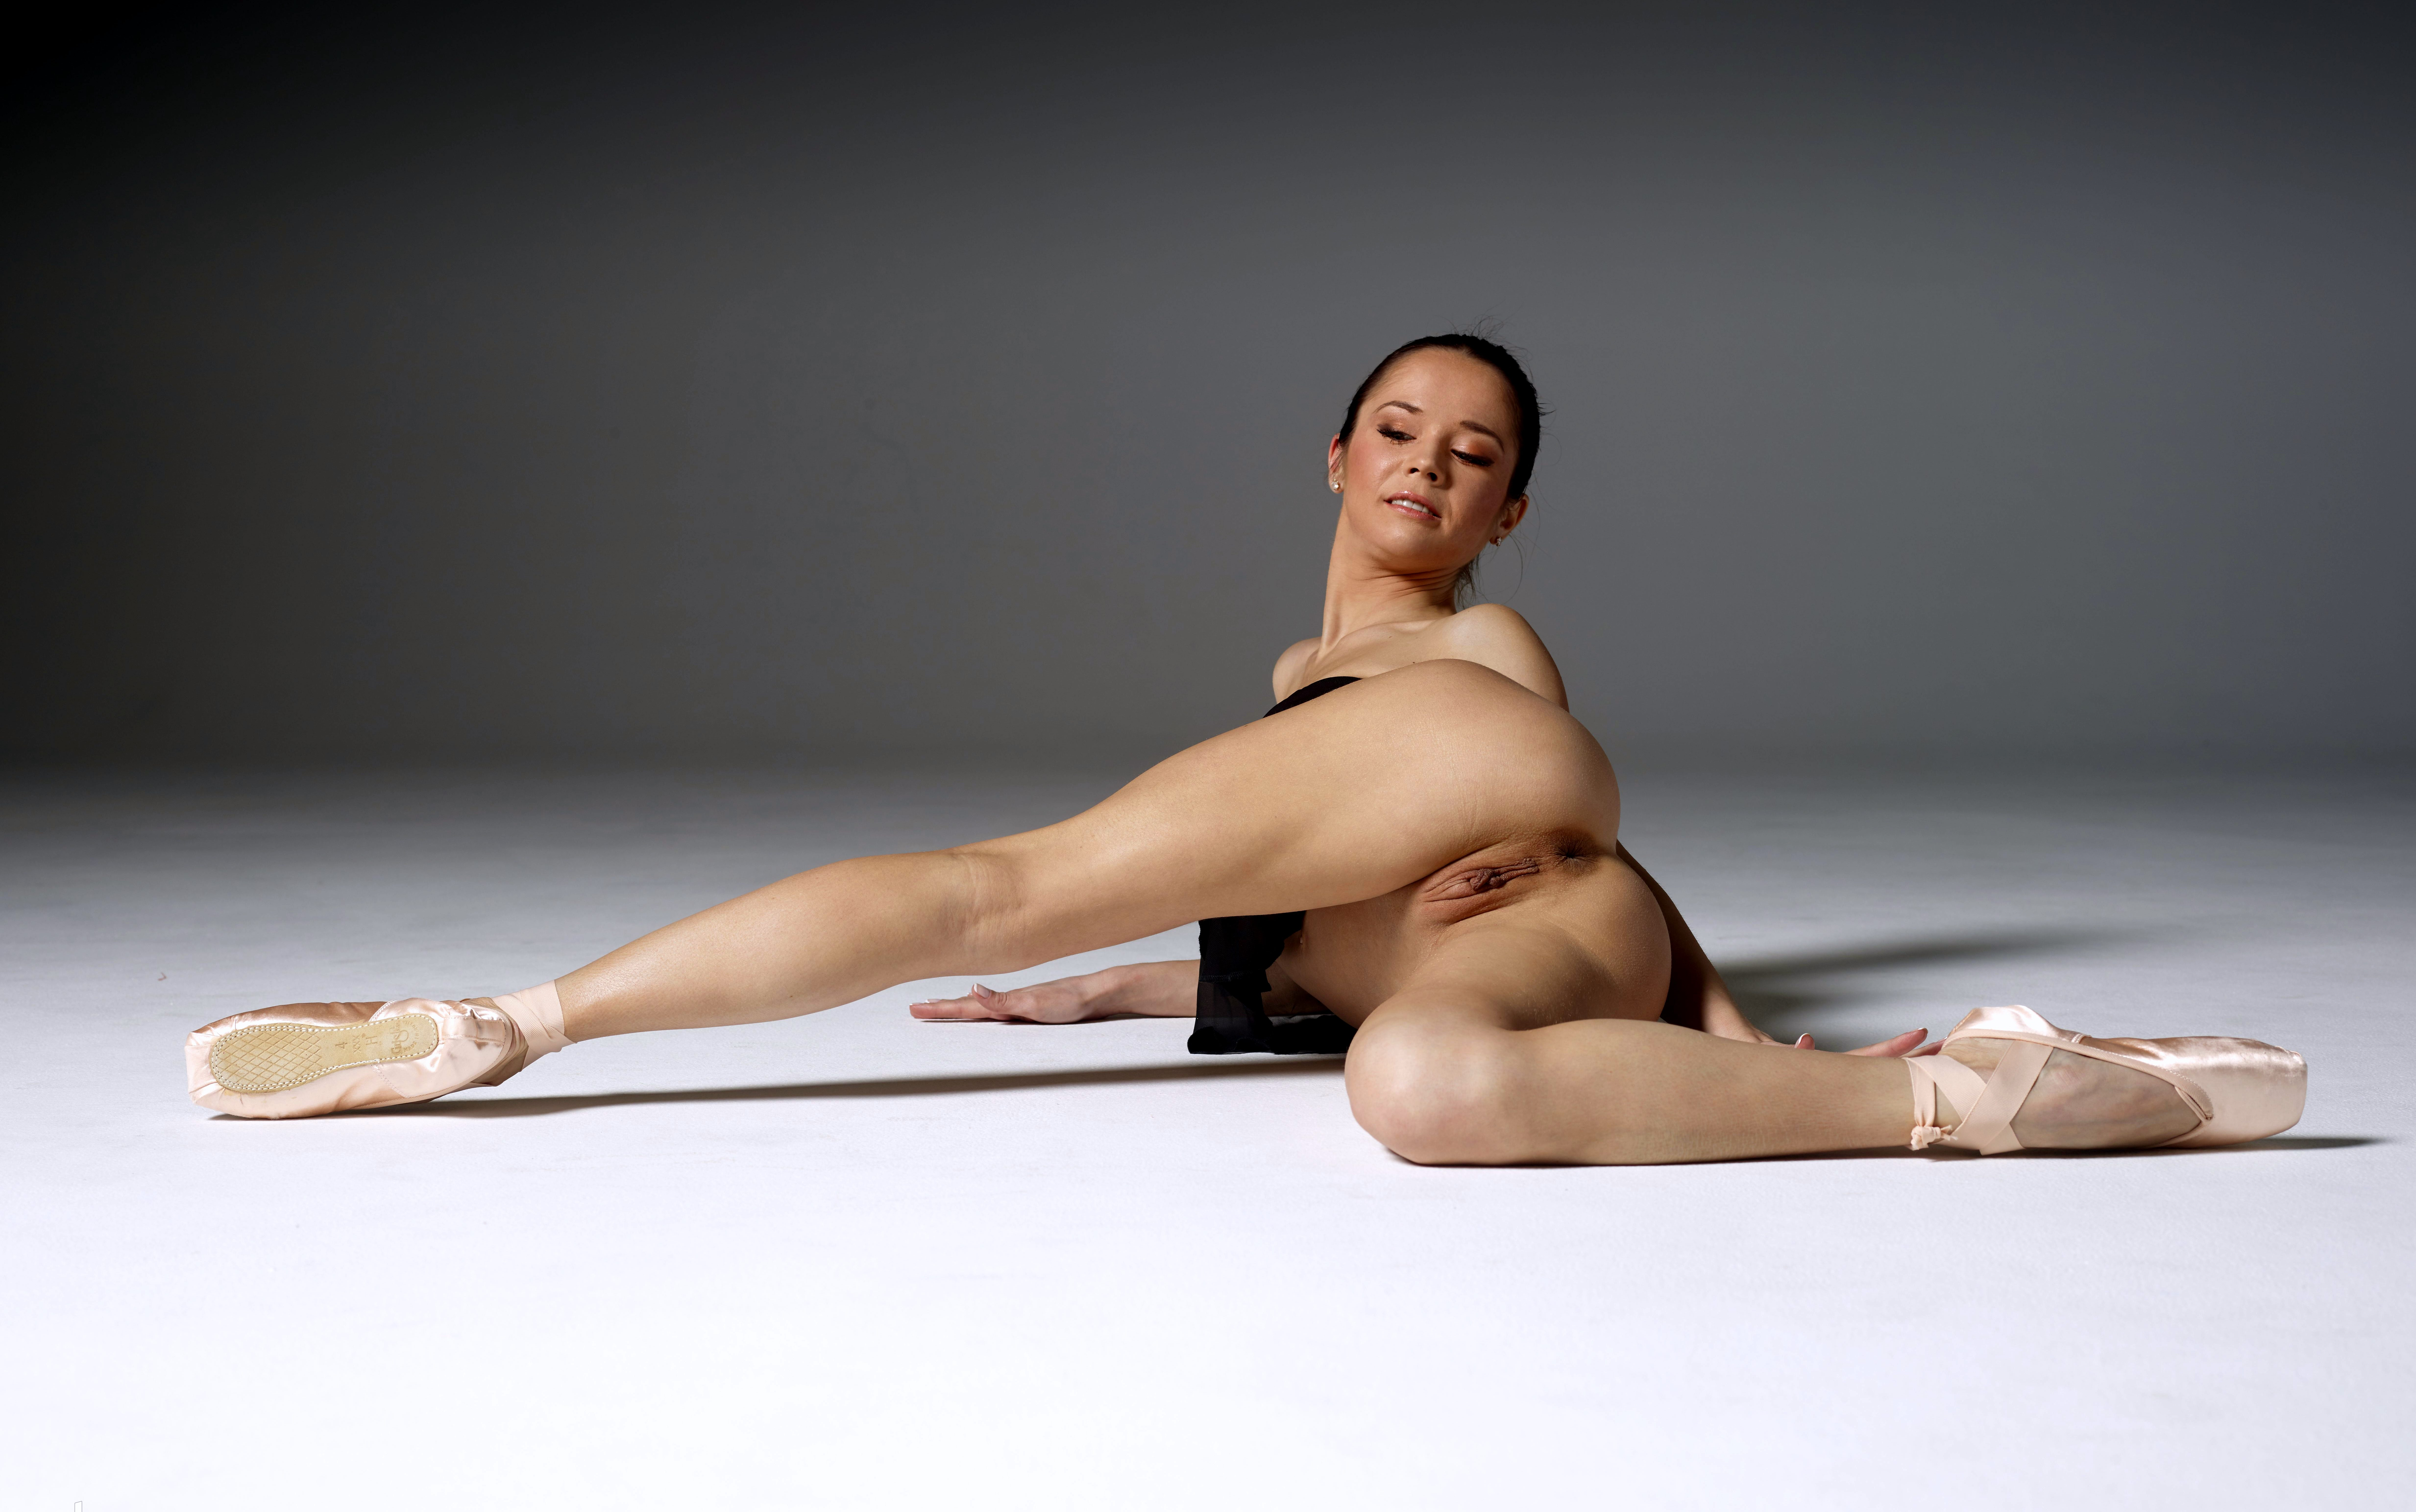 nude splits show labia